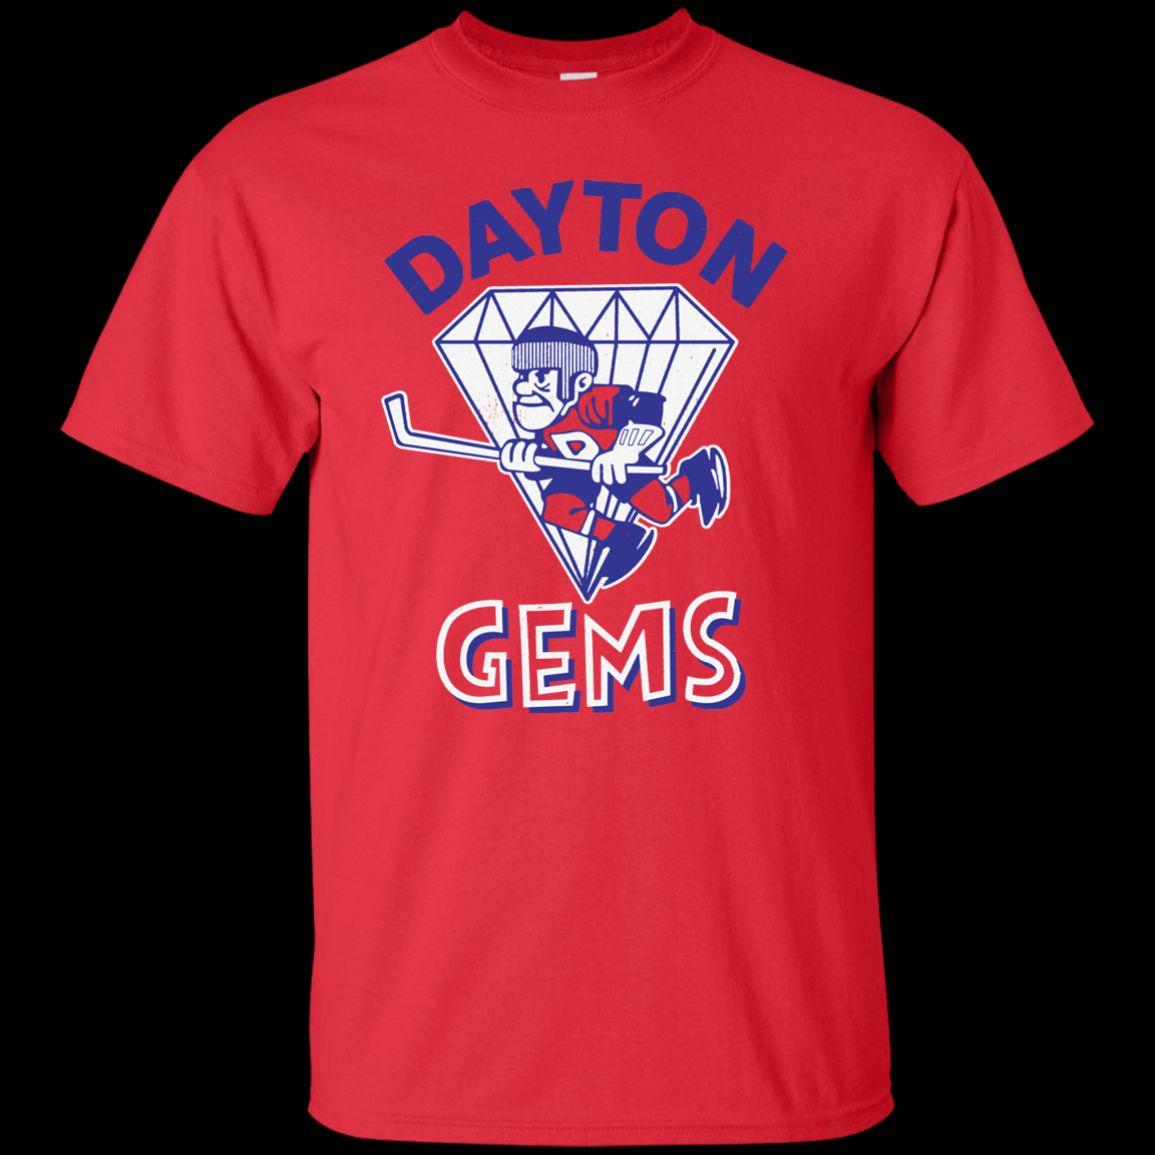 Dayton Gems Retro Hockey 1970 S 1980 S Jersey Logo Support Dropship T Shirt  T Shirt Men Man S XL 3XL Custom Short Sleeve Boyfriend S 3XL T S Really  Funny ... cab2189fa